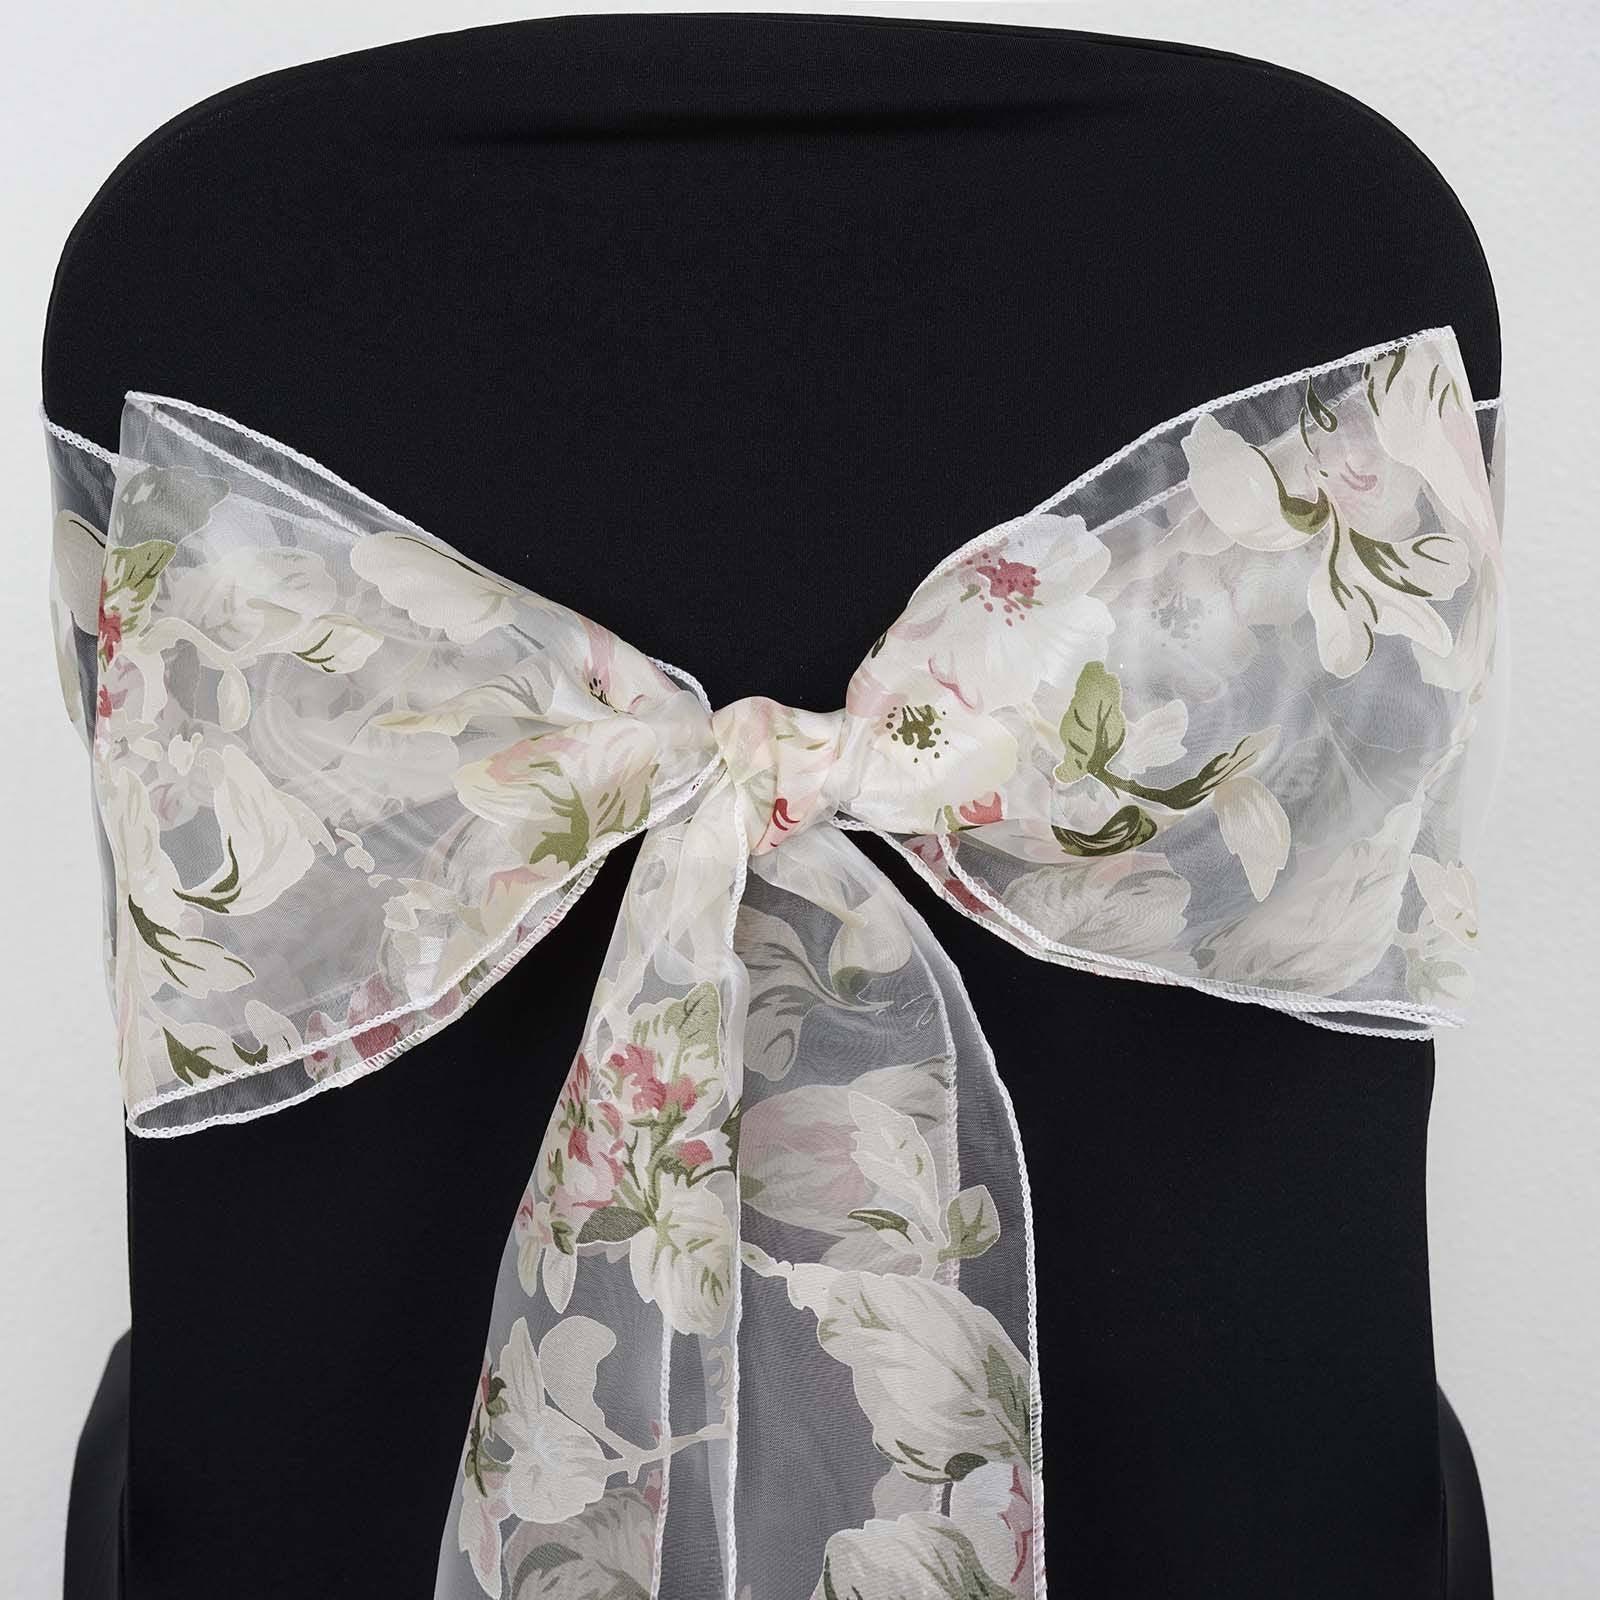 blush chair sashes gym ball uk white sheer organza sash with roses designs